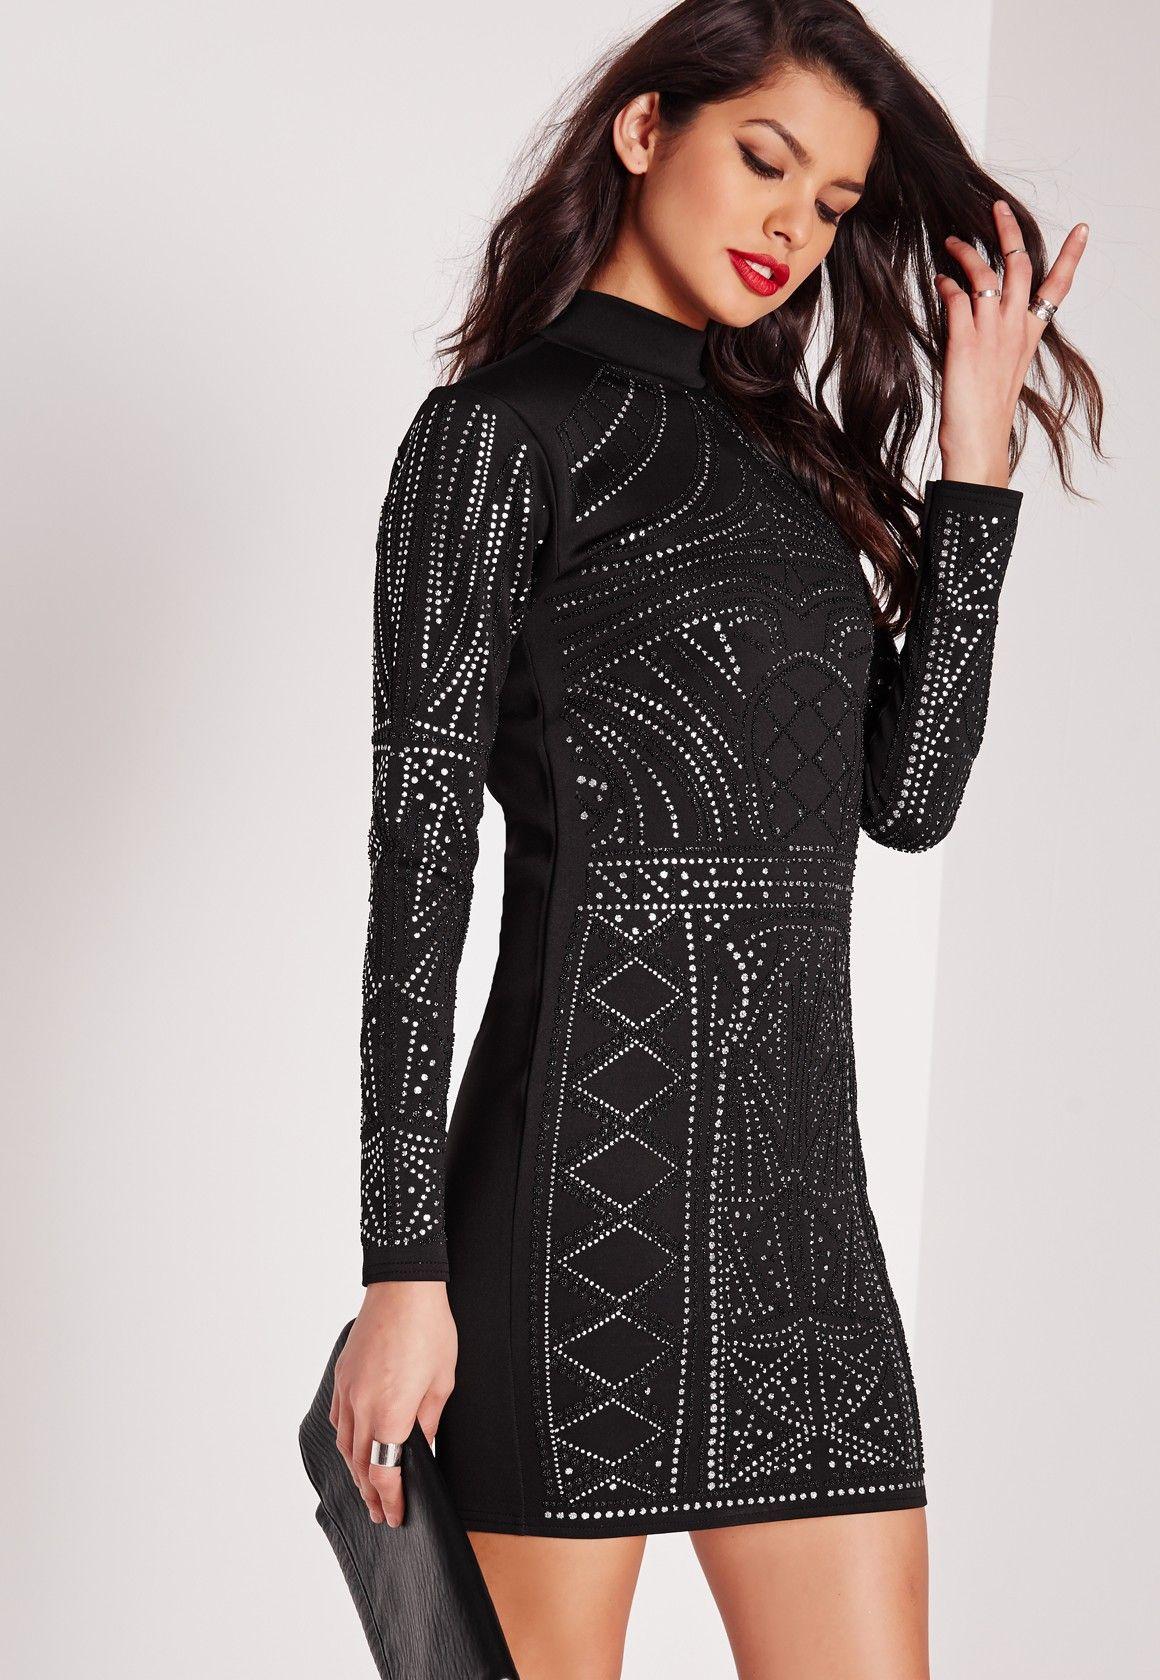 1c608022957 Missguided - Robe moulante noire perles effet caviar